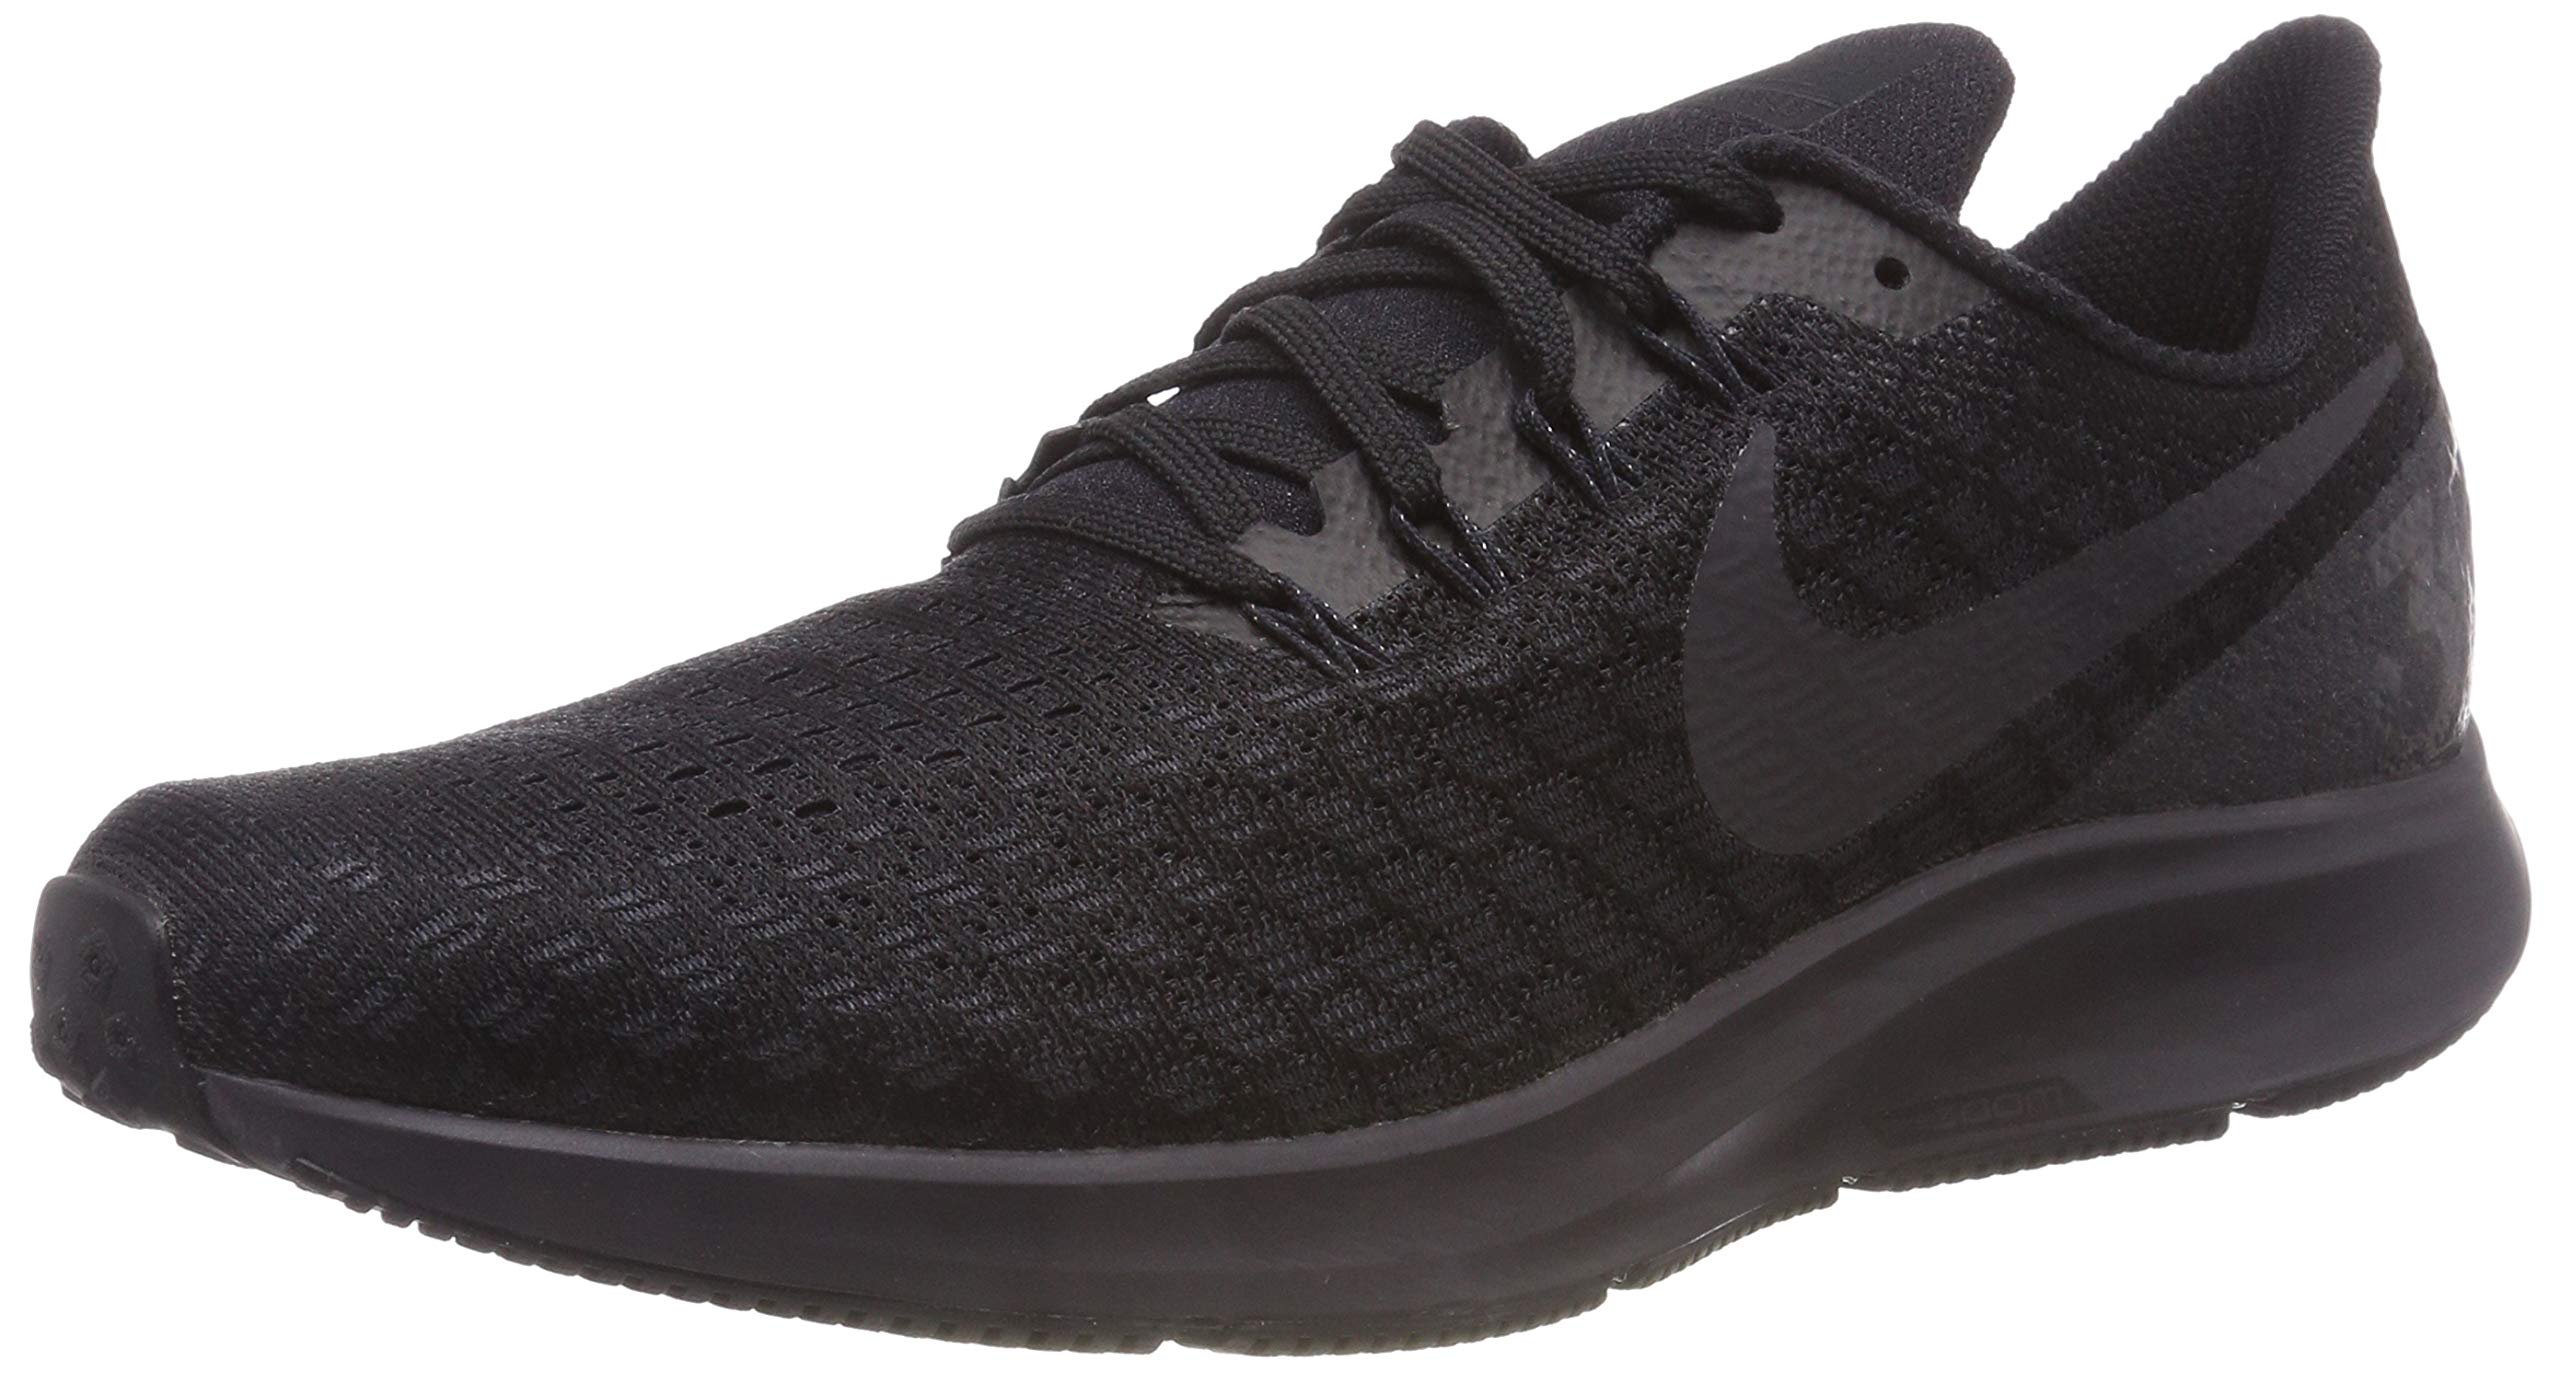 aefdd657c79d Galleon - Nike Men s Air Zoom Pegasus 35 Running Shoe 8.5 Black